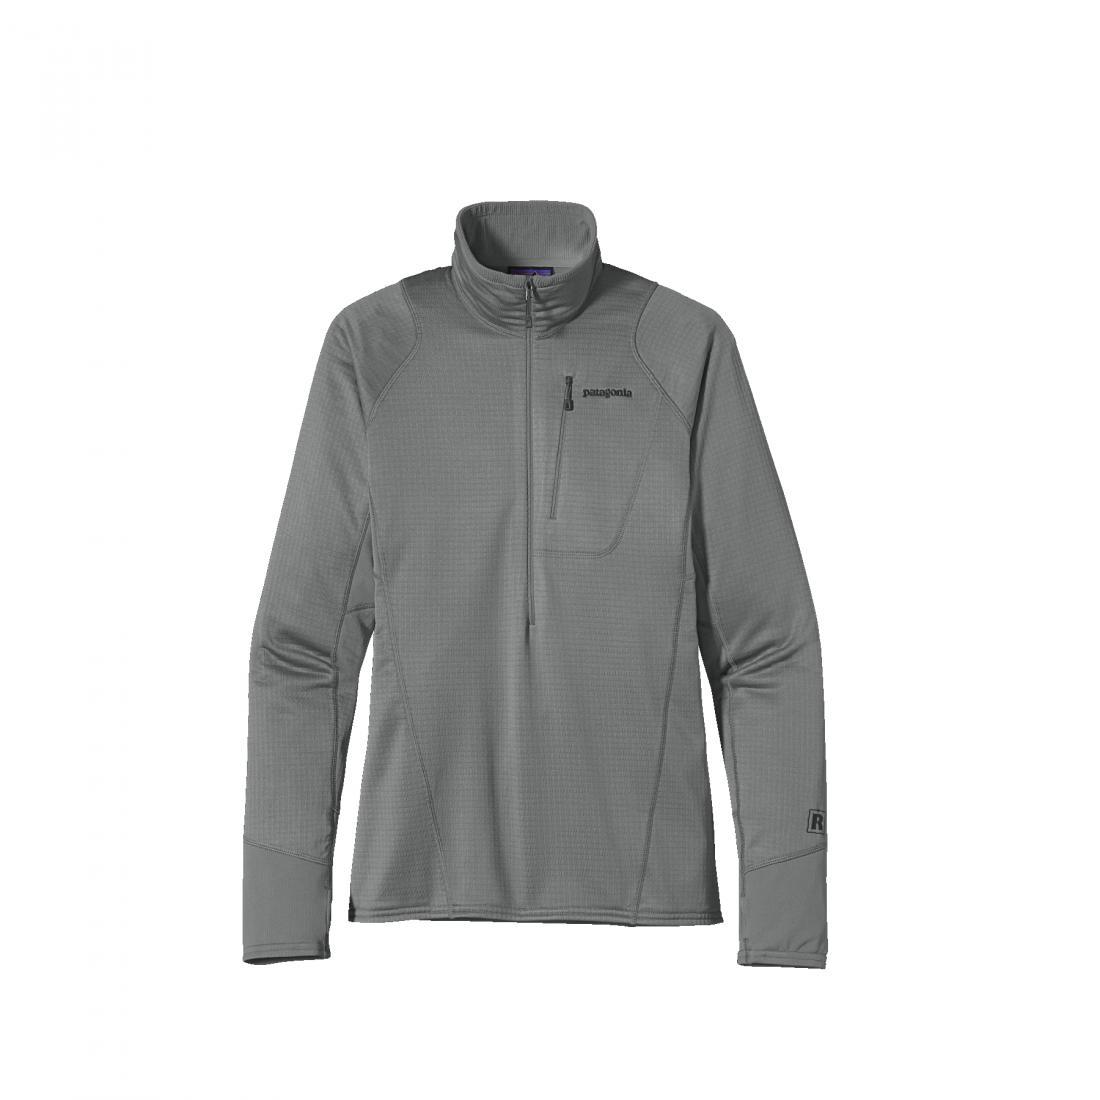 Куртка 40108 MS R1 P/OКуртки<br><br><br>Цвет: Темно-серый<br>Размер: S